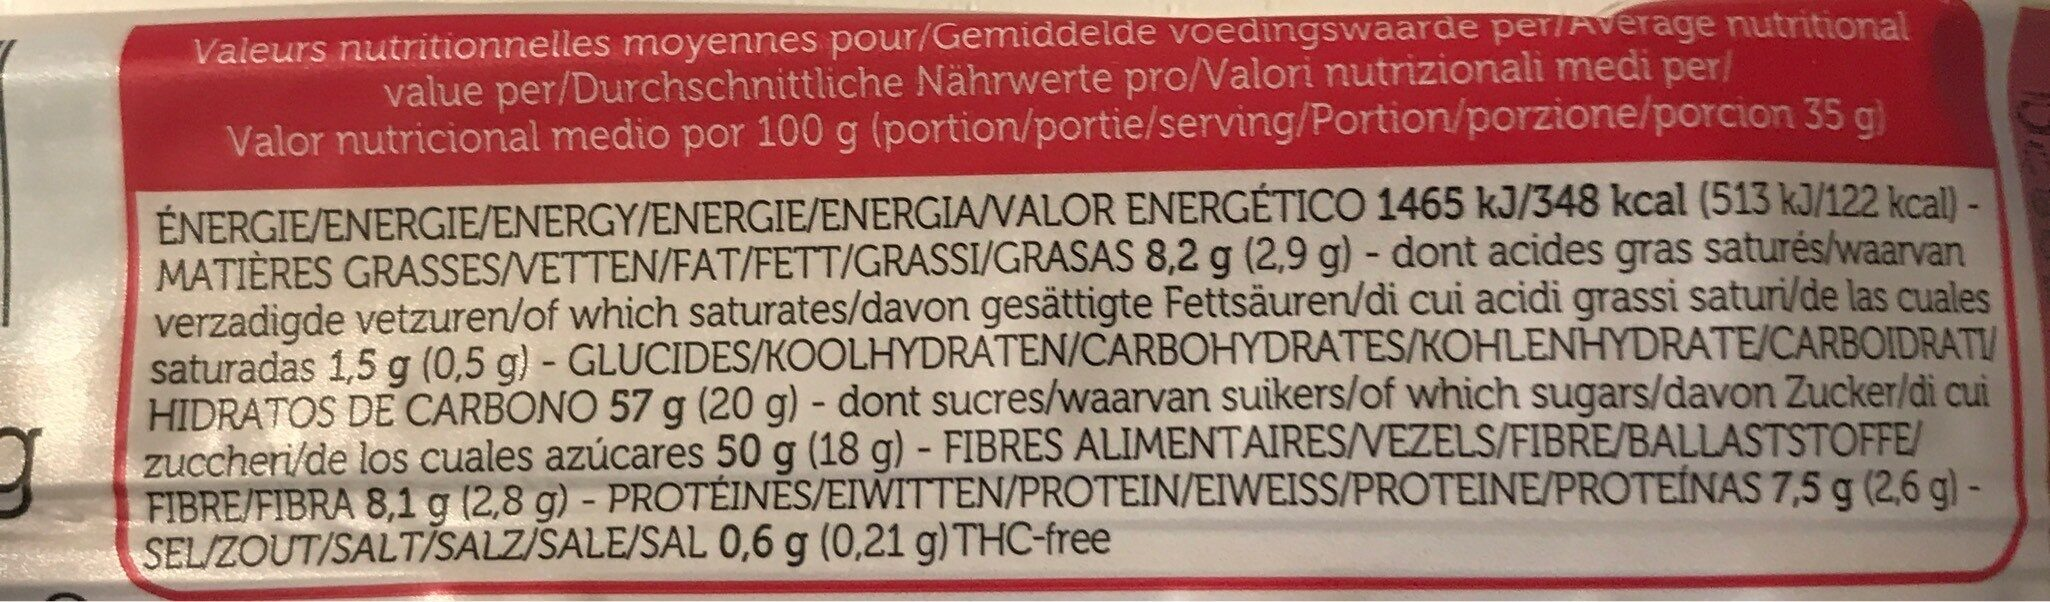 Raw Ba Goji & Hemp Chanvre - Informations nutritionnelles - fr